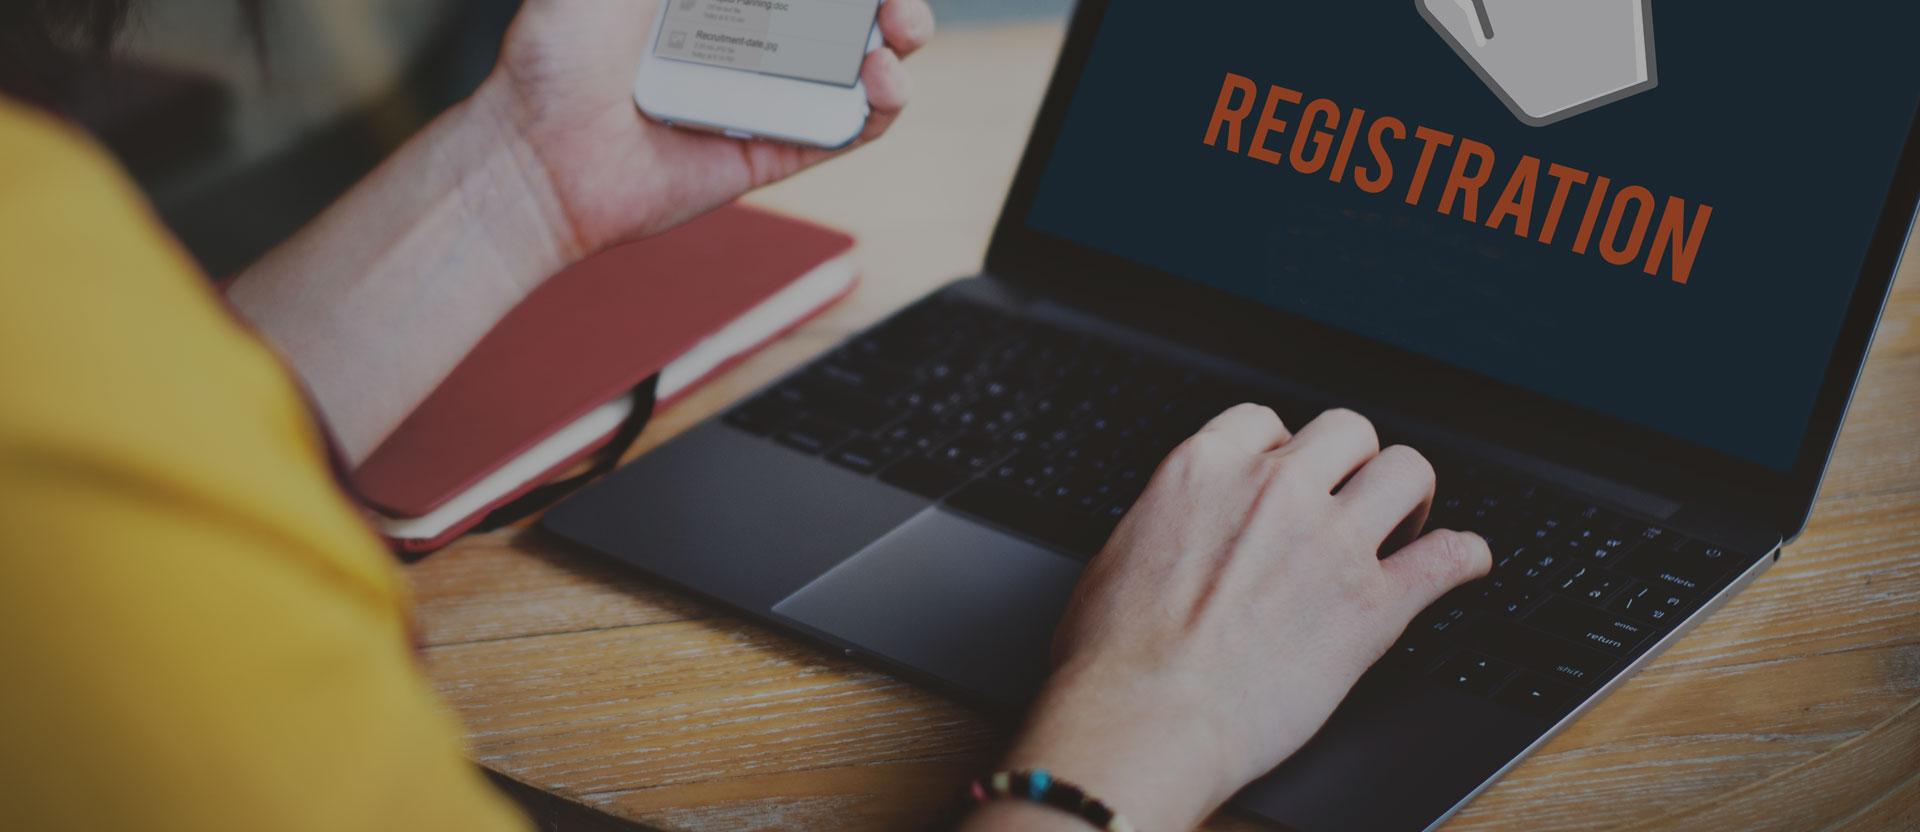 Product Registration Process